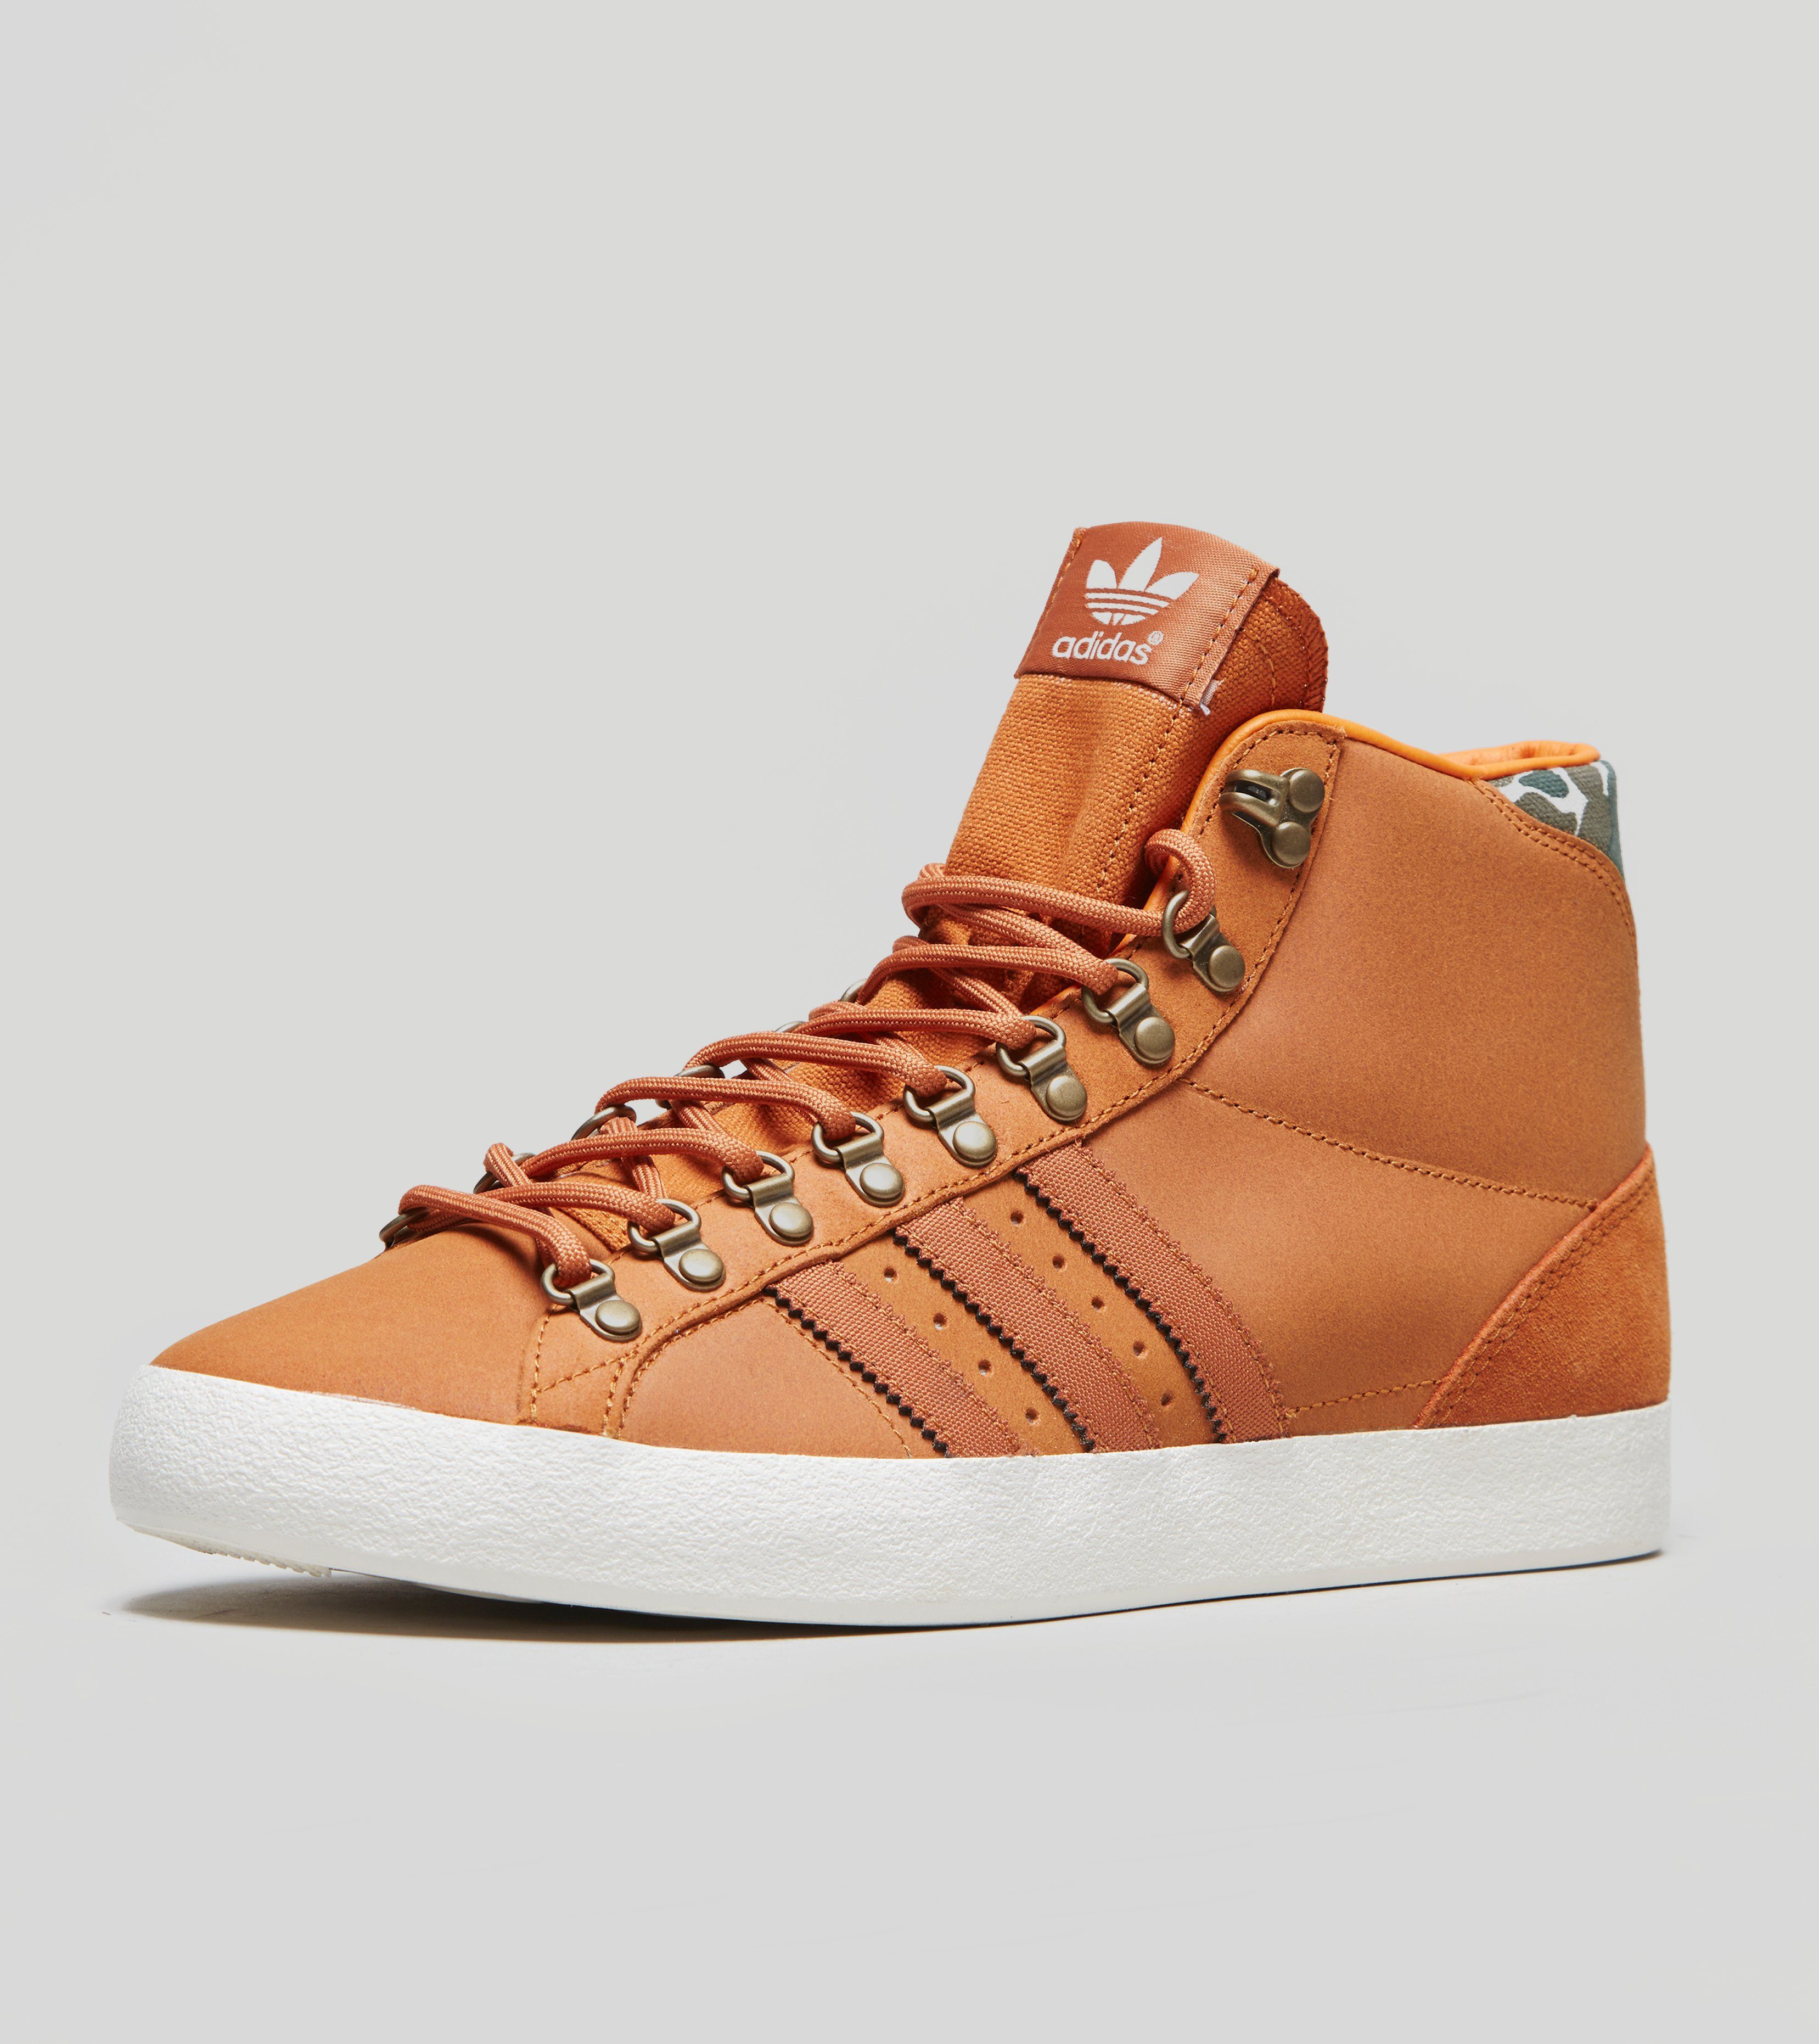 sneakers for cheap ad647 fd8d6 adidas Originals Basket Profi OG